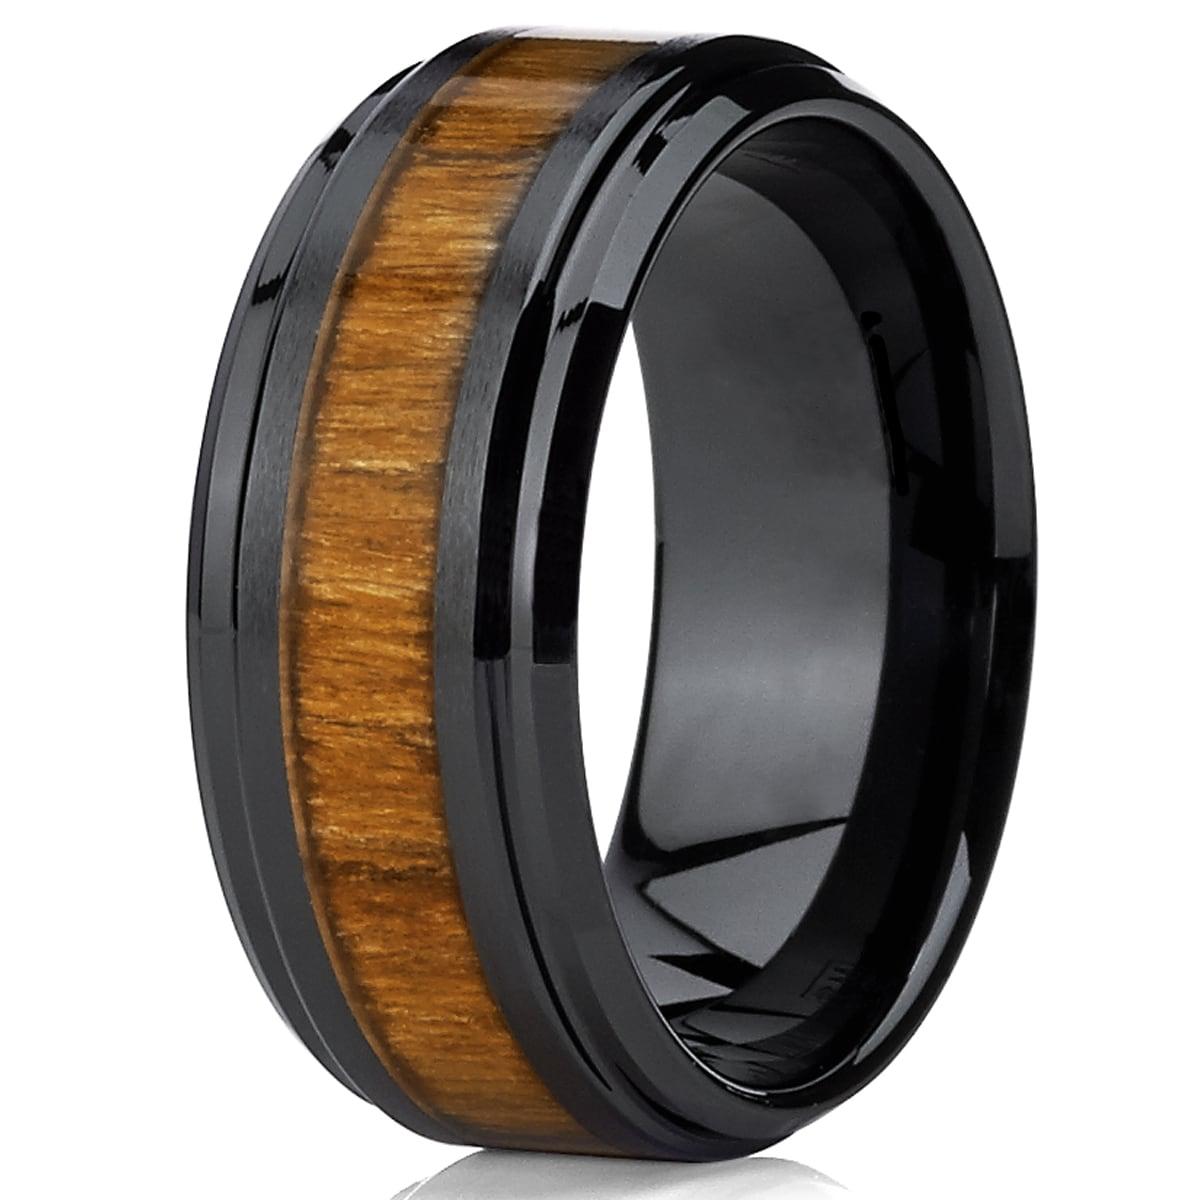 Oliveti Black Ceramic Ring Wedding Band With Real Koa Wood Inlay 9 Mm